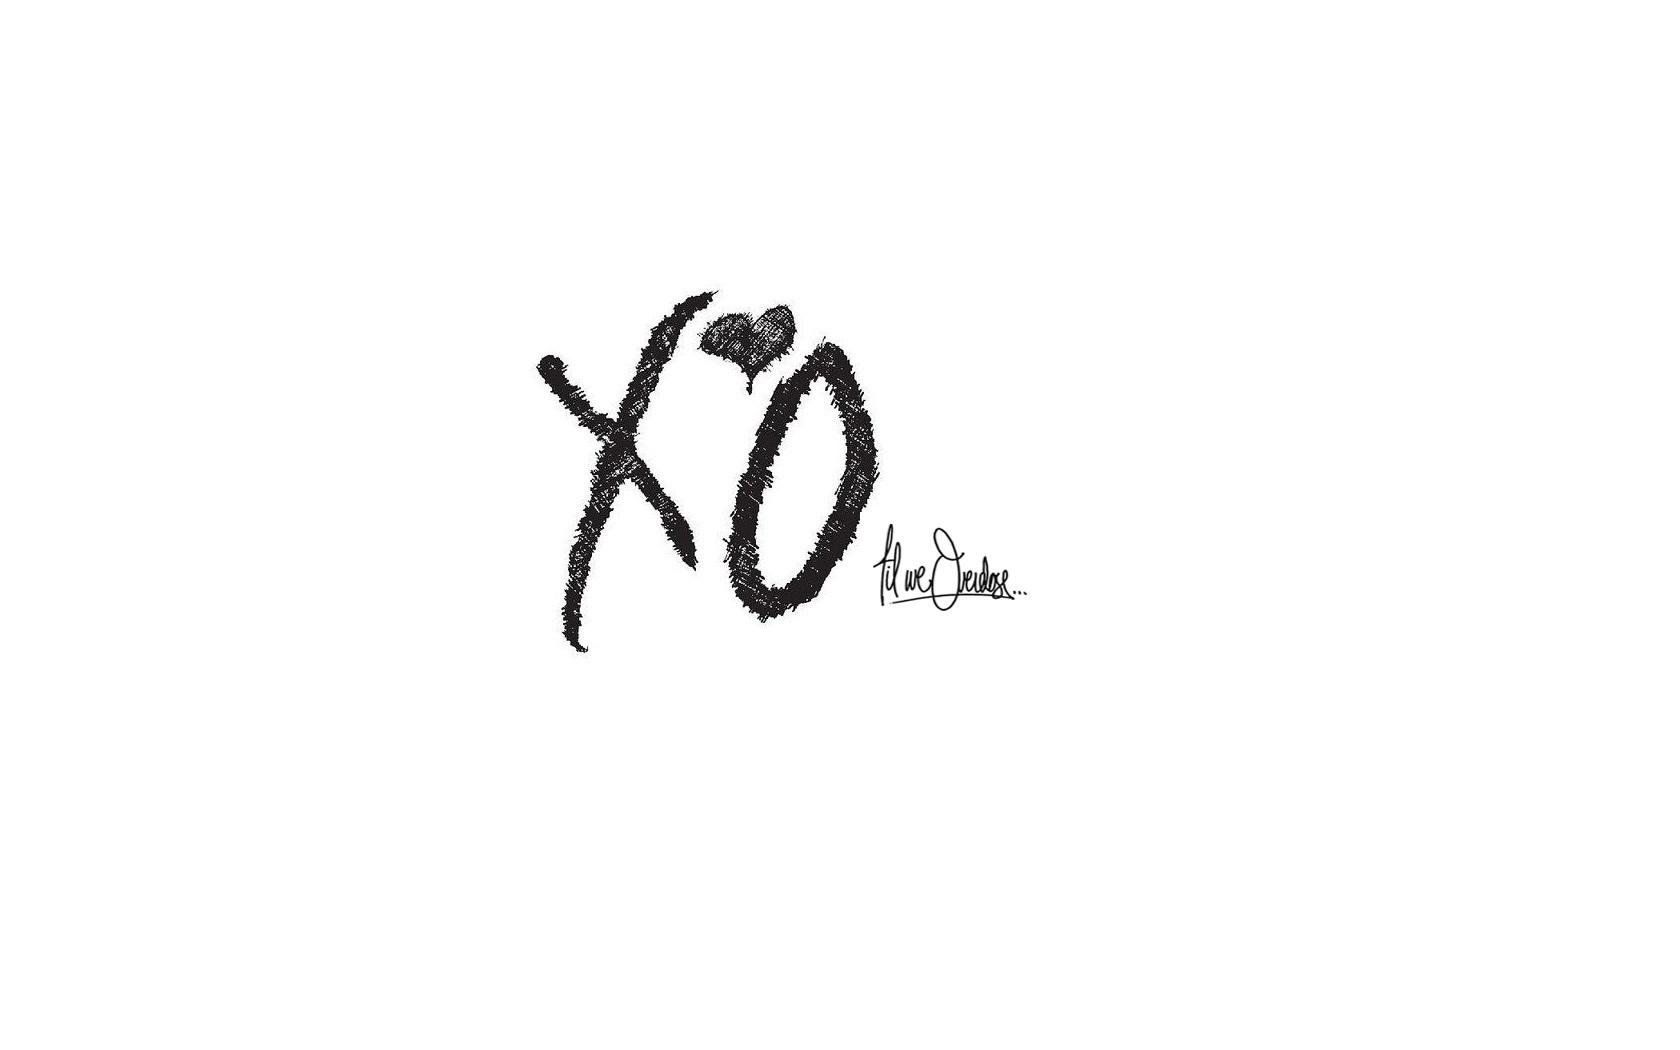 Xo The Weeknd XO Wallpaper - Wallpap...